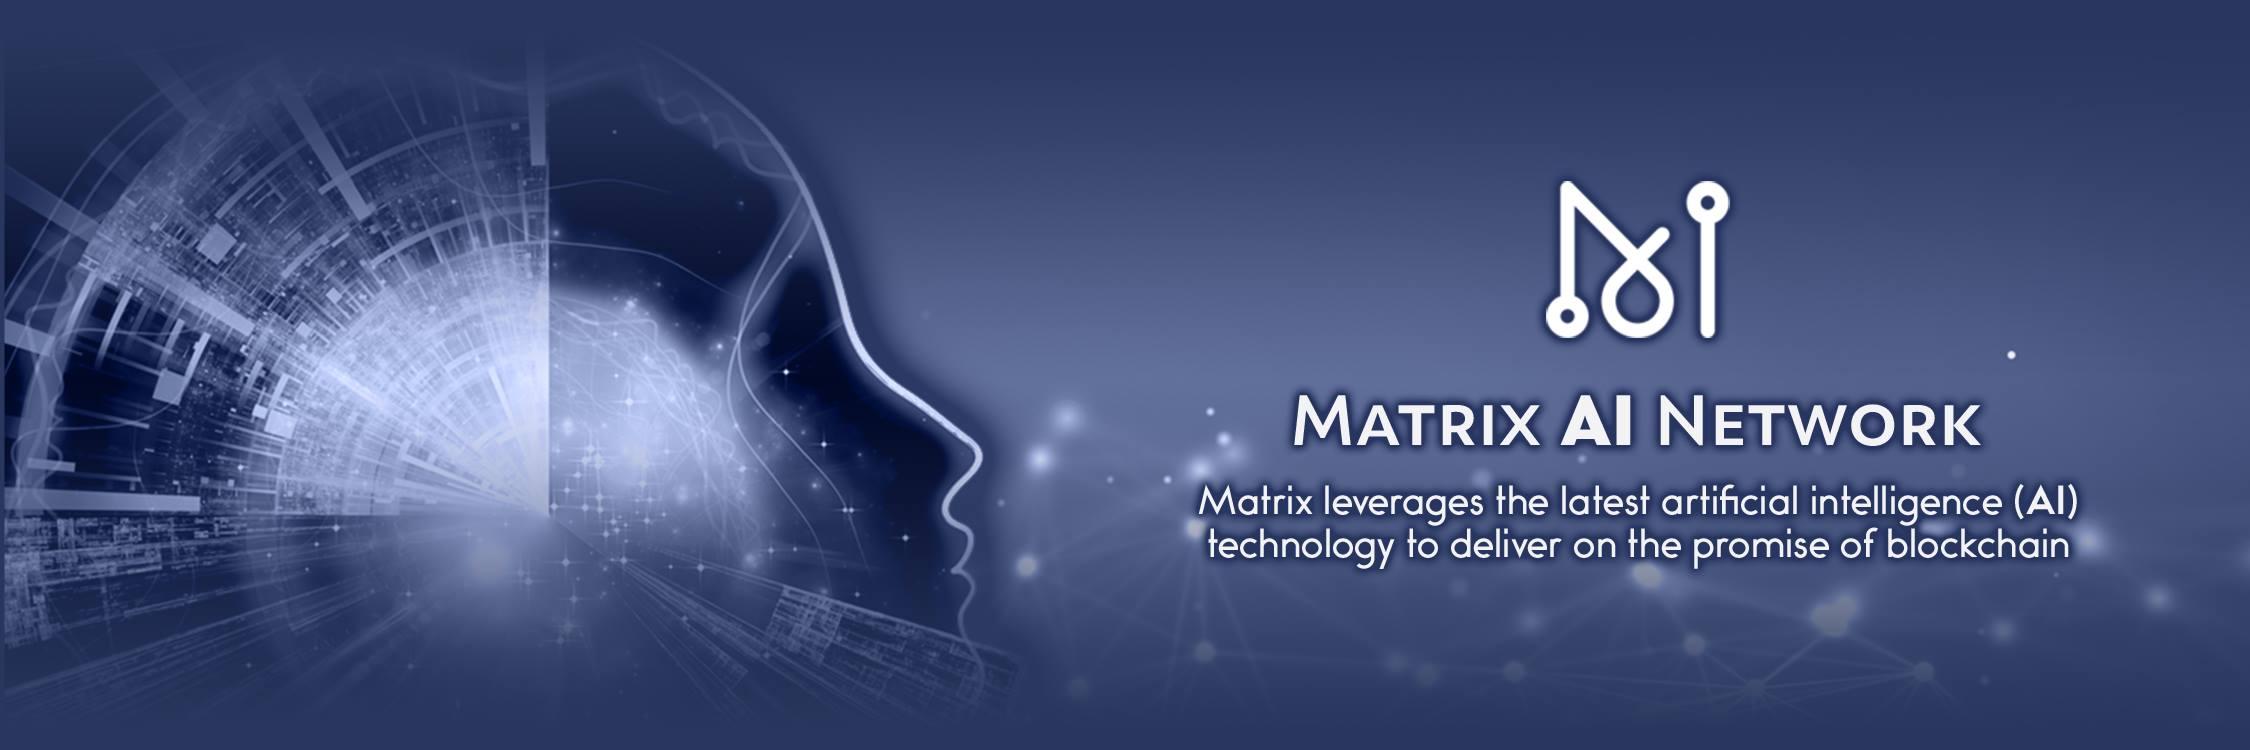 MATRIX AI NETWORK IMAGE